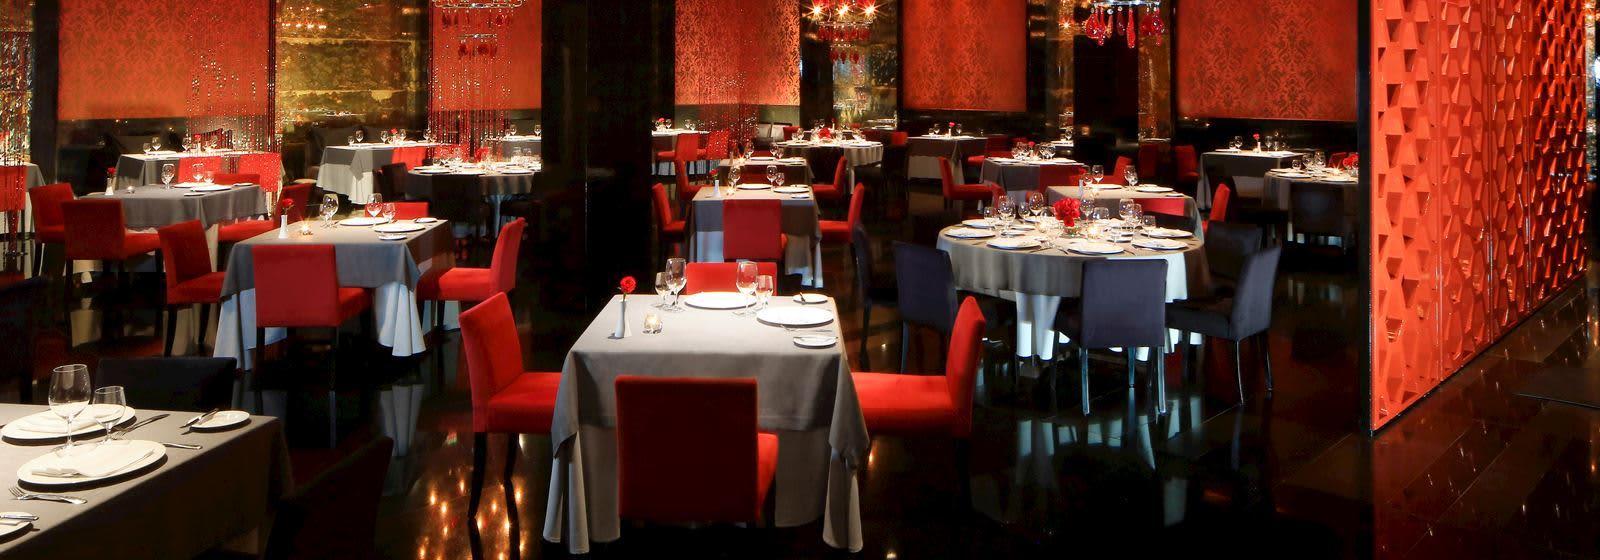 Grand Velas Riviera Maya - Restaurante Piaf